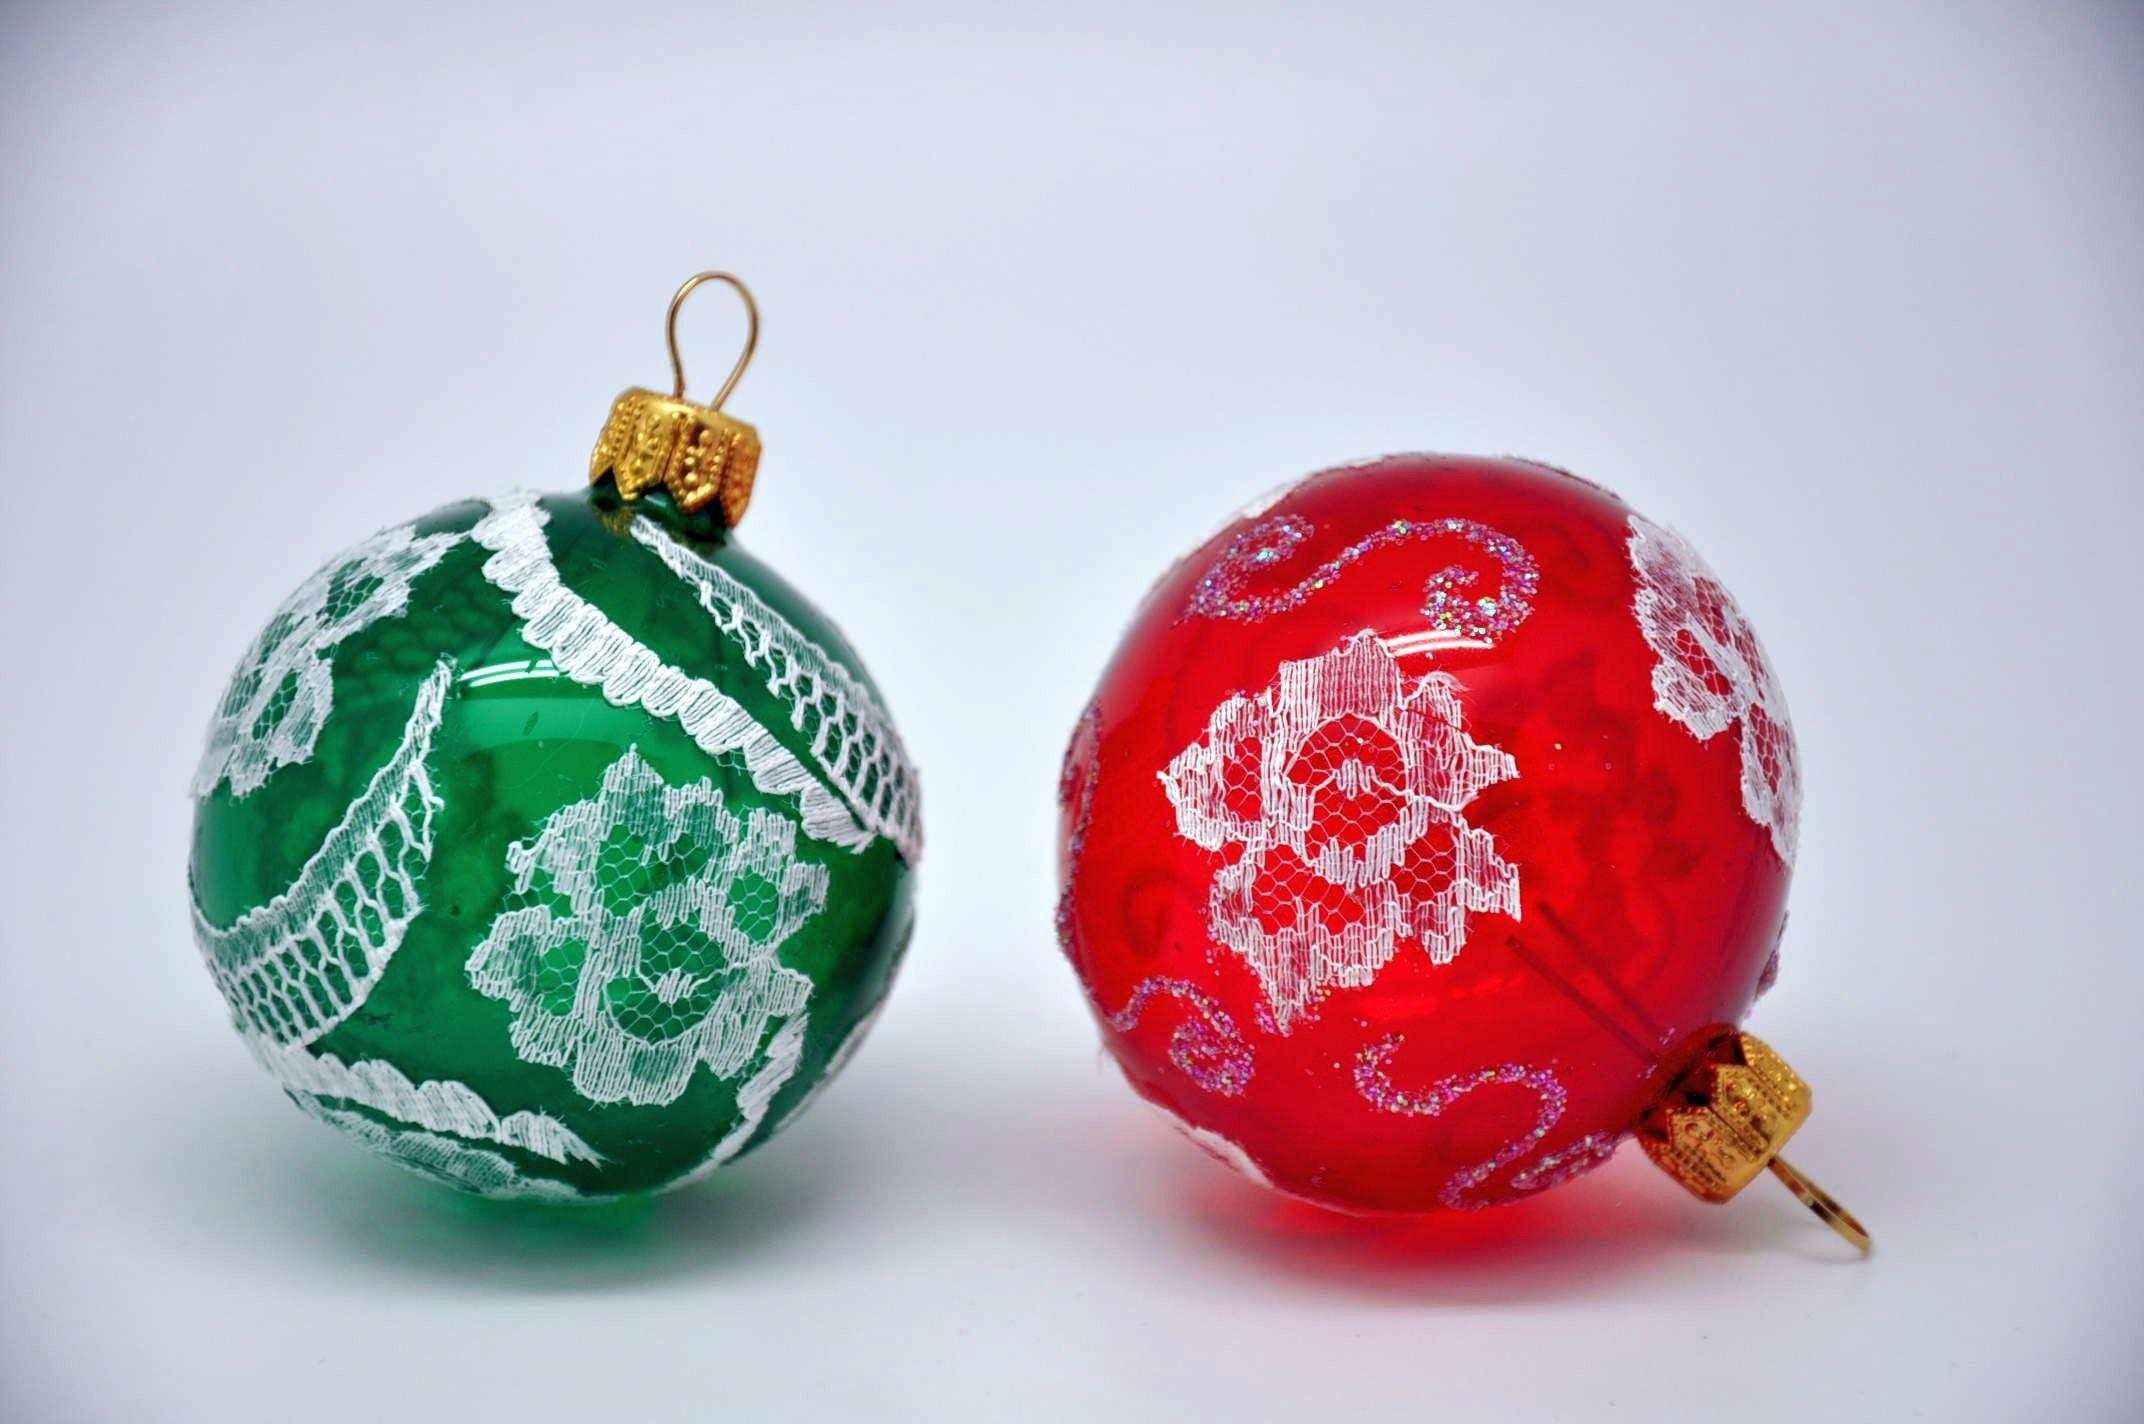 Bombka w 5 minut # Christmas DIY